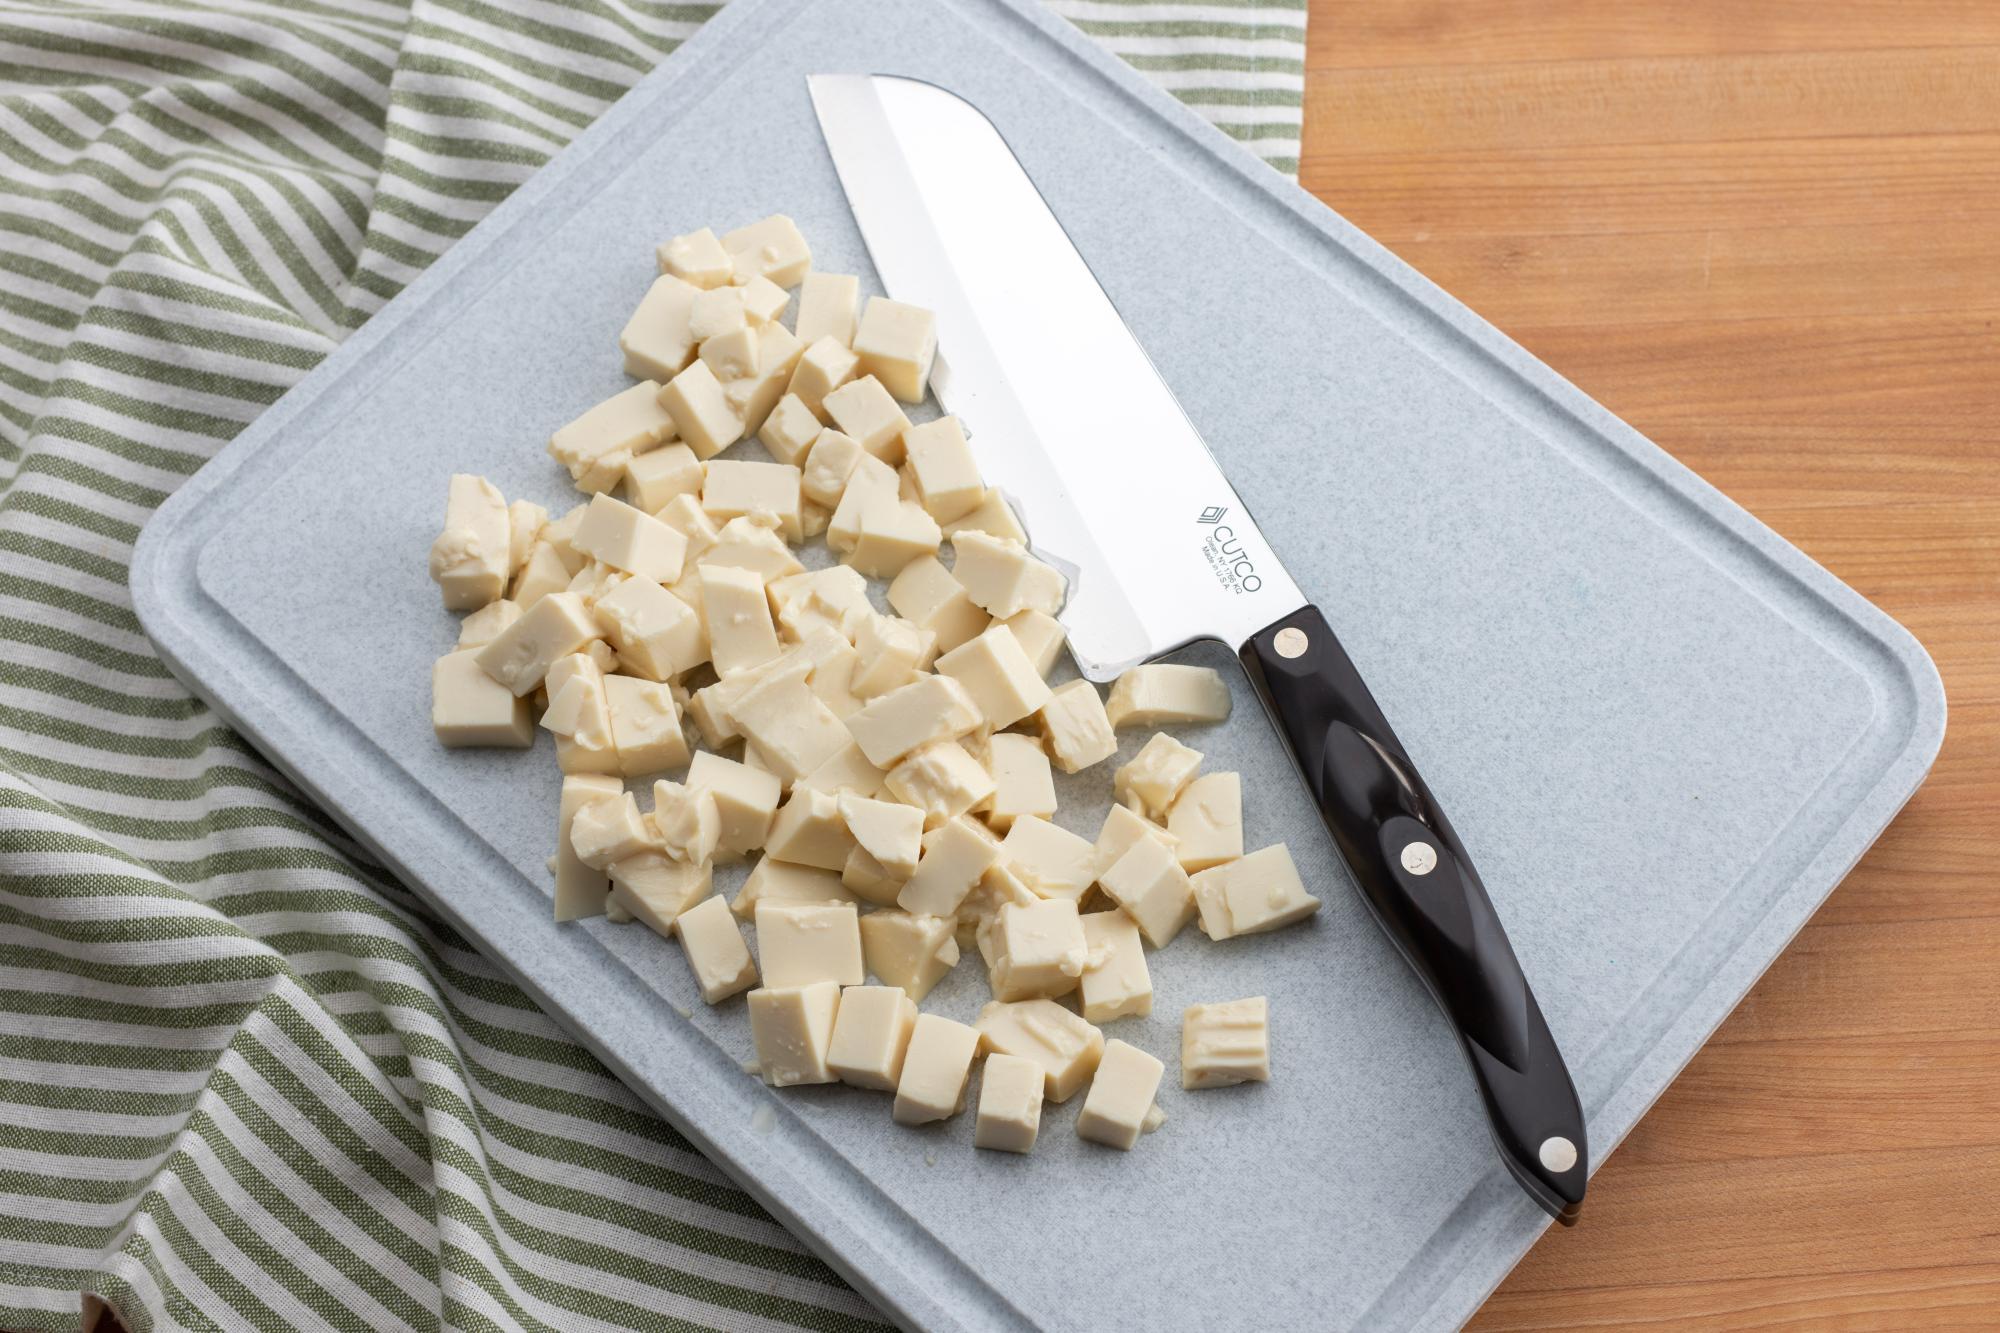 Cubed tofu with a Santoku